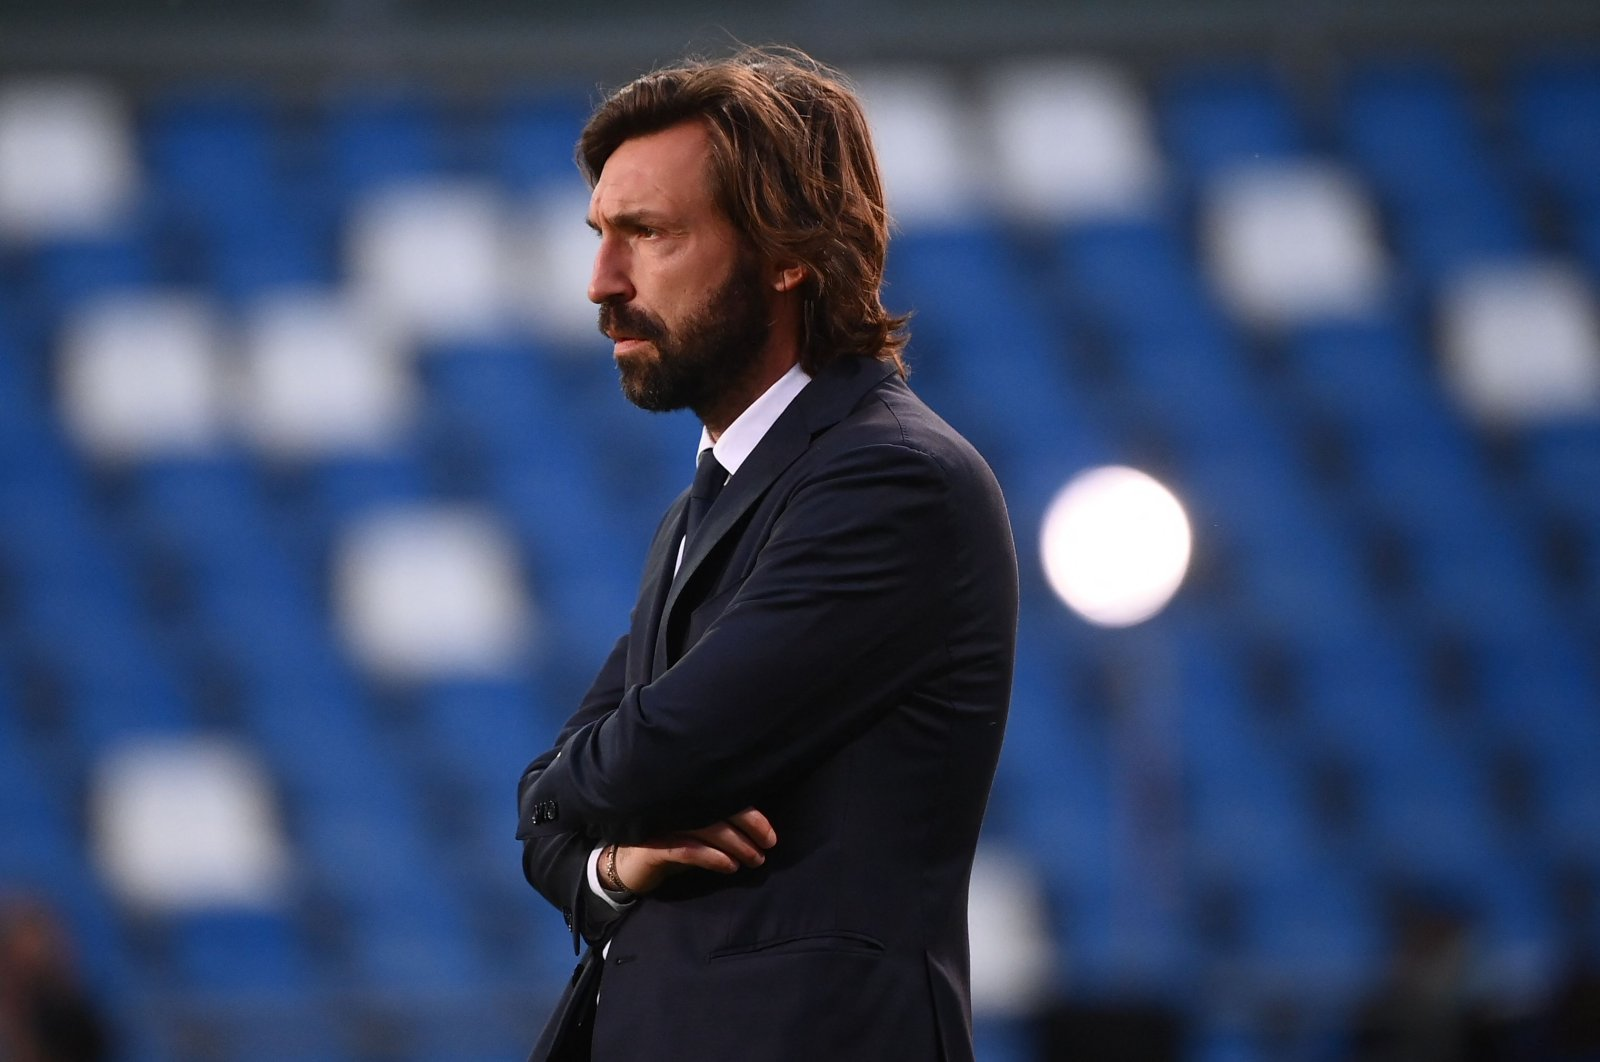 Juventus' Italian coach Andrea Pirlo looks on prior to the Italian Serie A match against Sassuolo at the Mapei-Citta del Tricolore stadium in Reggio Emilia, Italy, May 12, 2021. (AFP Photo)